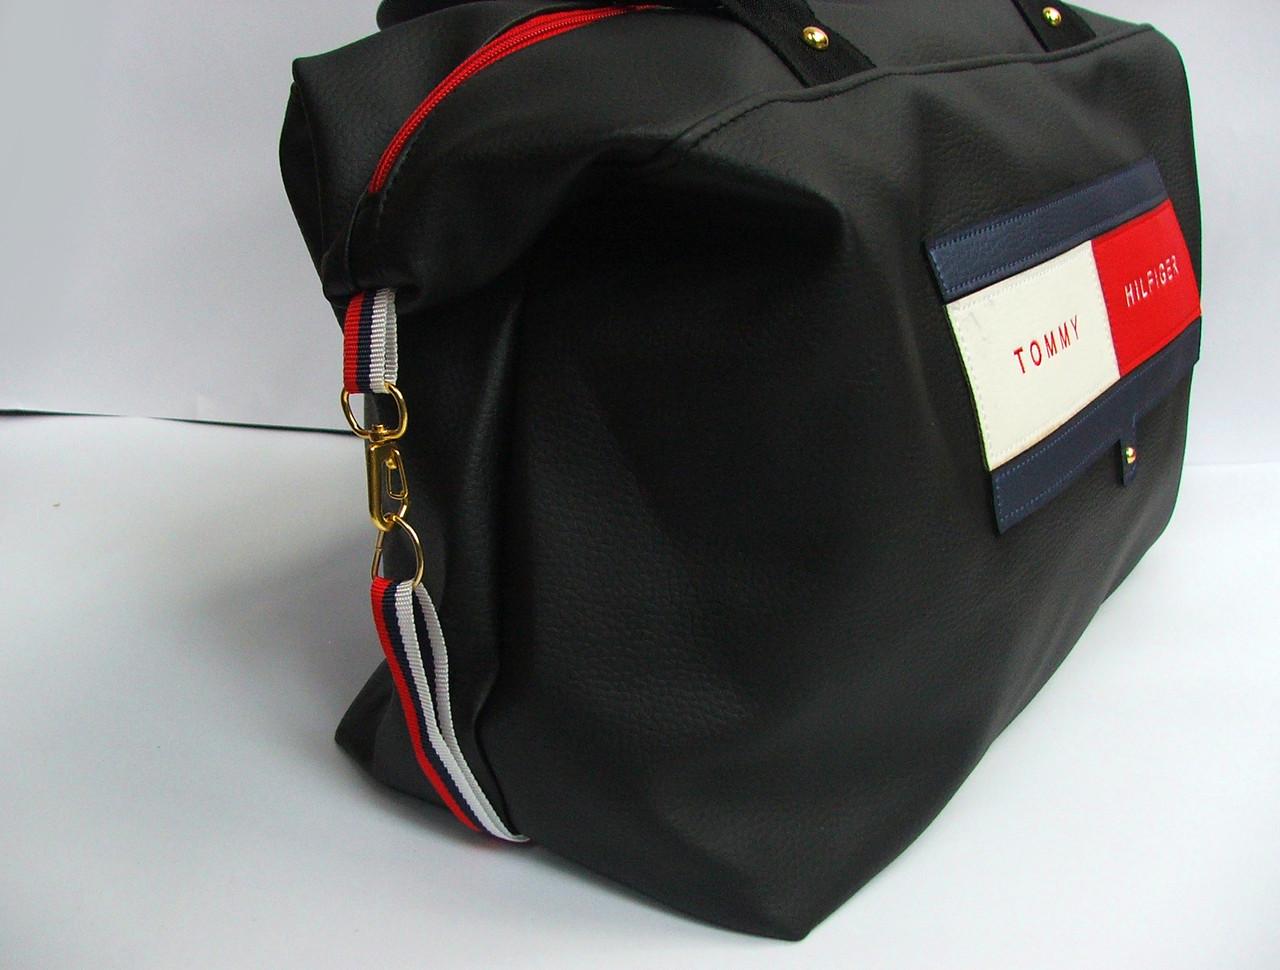 1fe6a5285819 Магазин спортивных сумок томми хилфигер Tommy Hilfiger: продажа ...